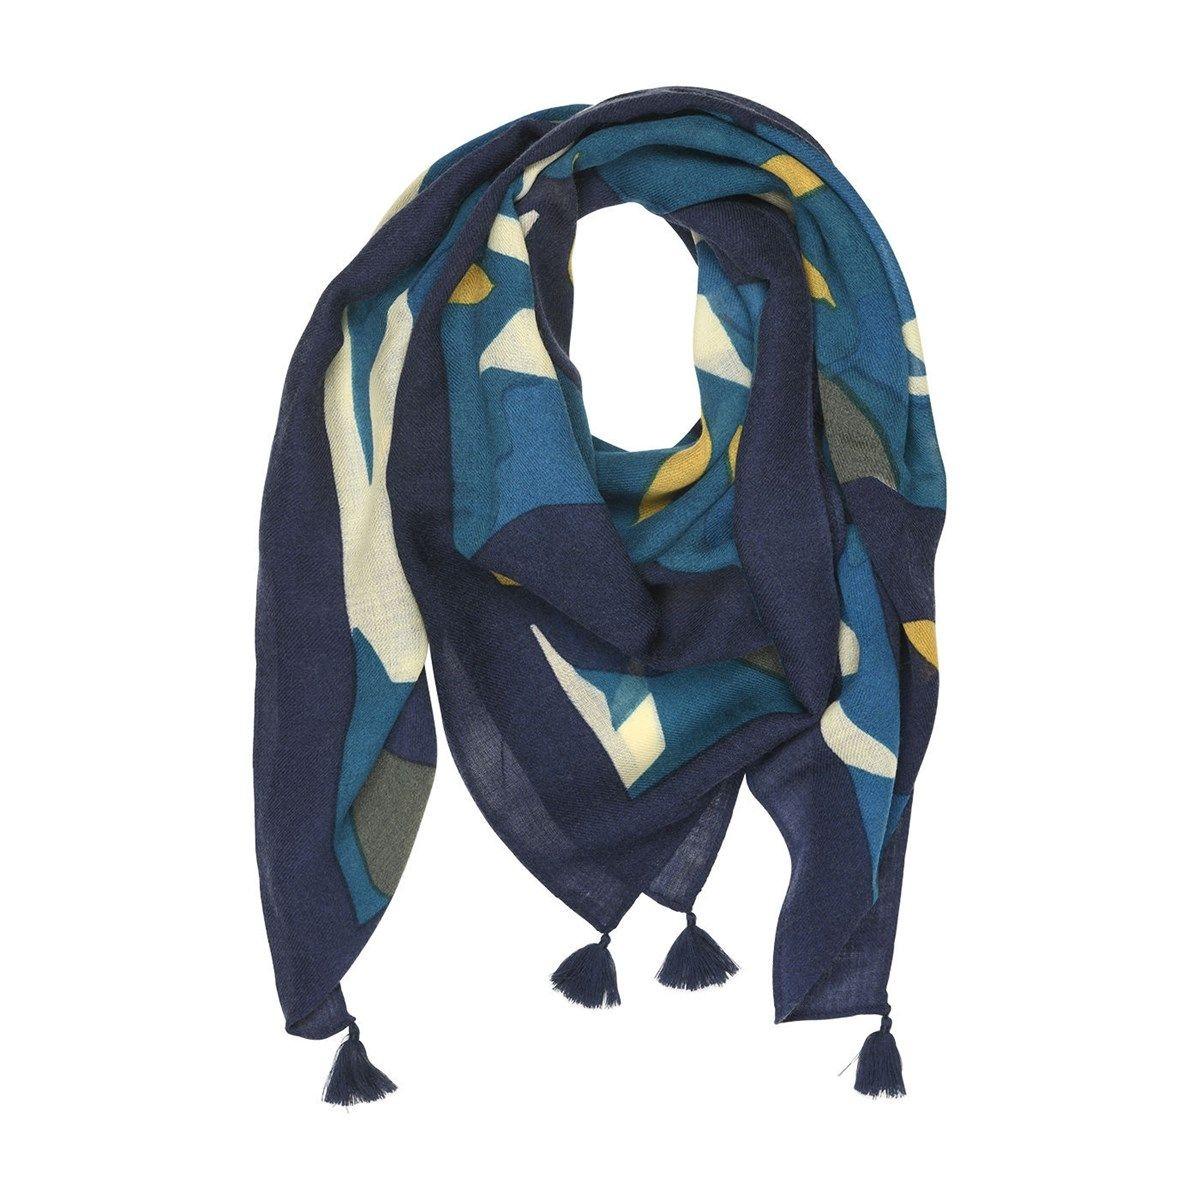 Foulard  feuilles 100% laine